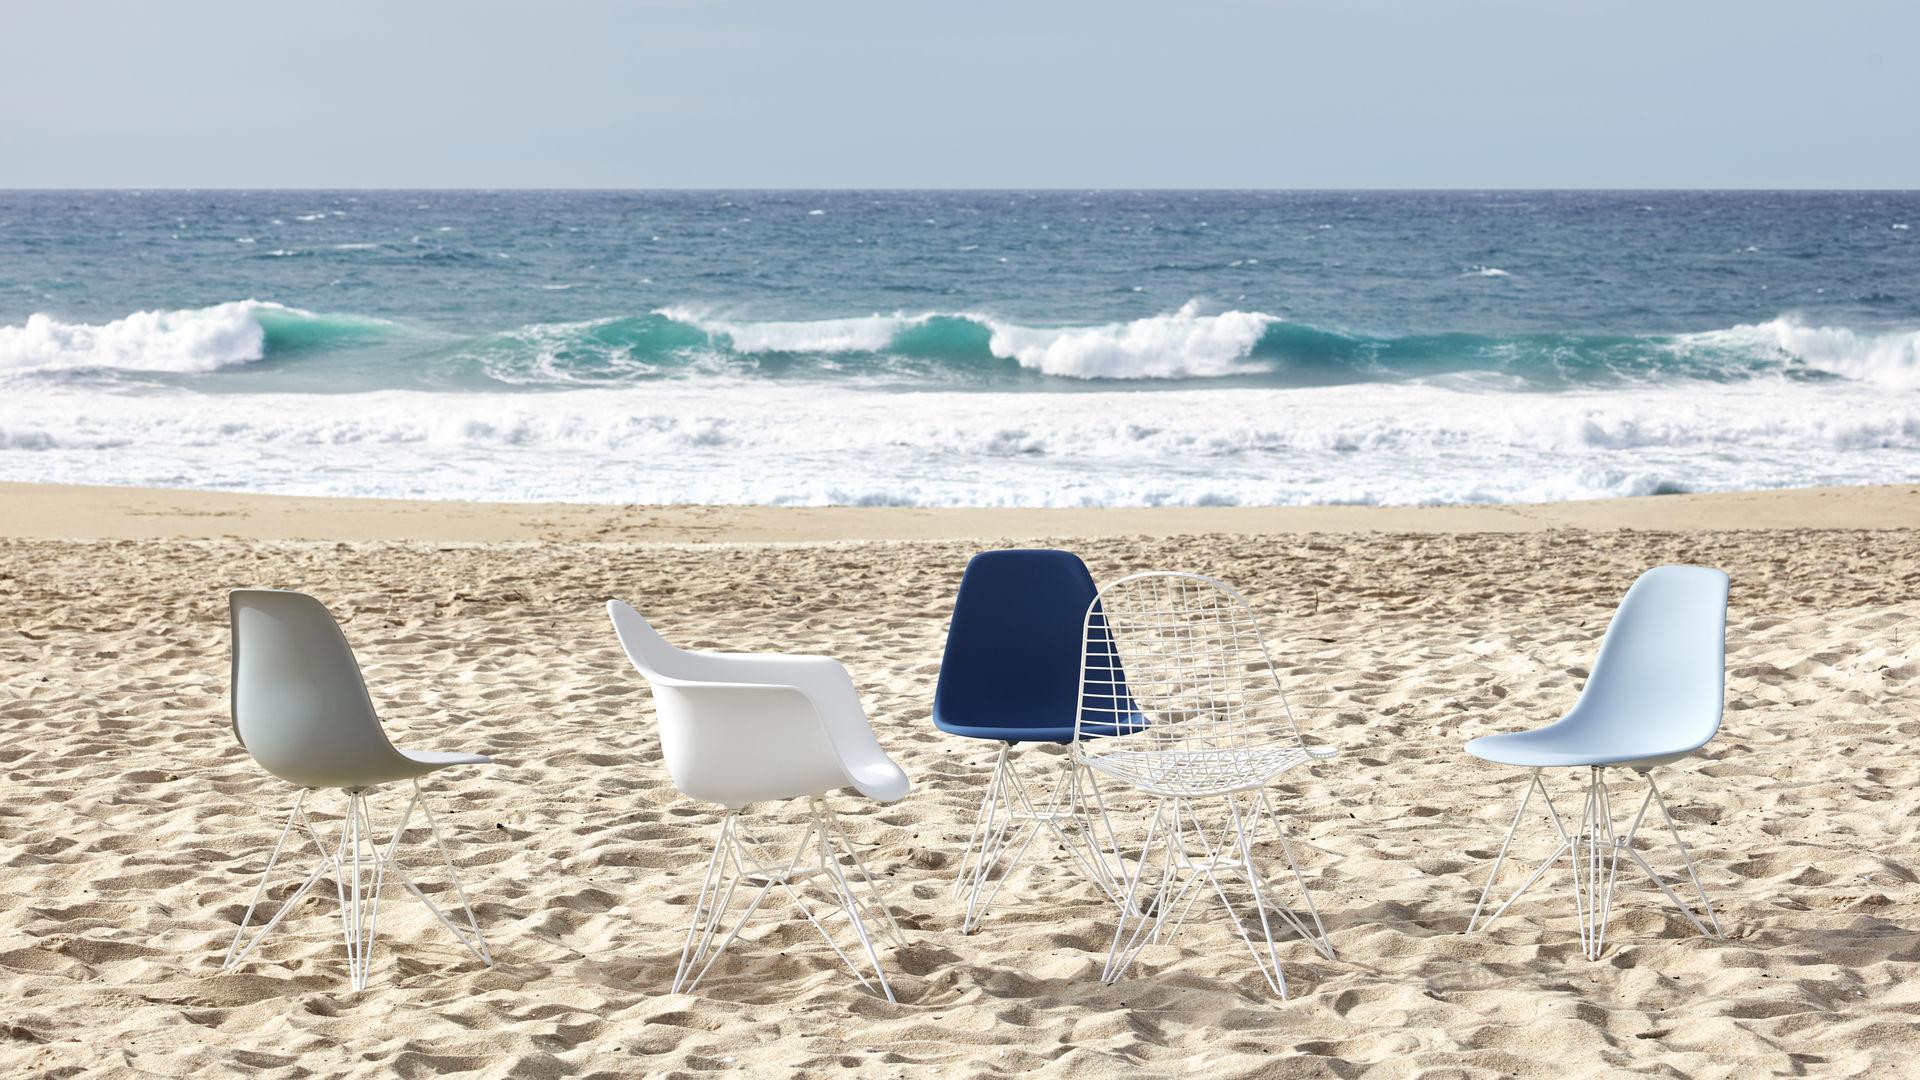 Eames Plastic Side Chair DSR Eames Plastic Armchair DAR Eames Wire Chair DKR_web_16-9